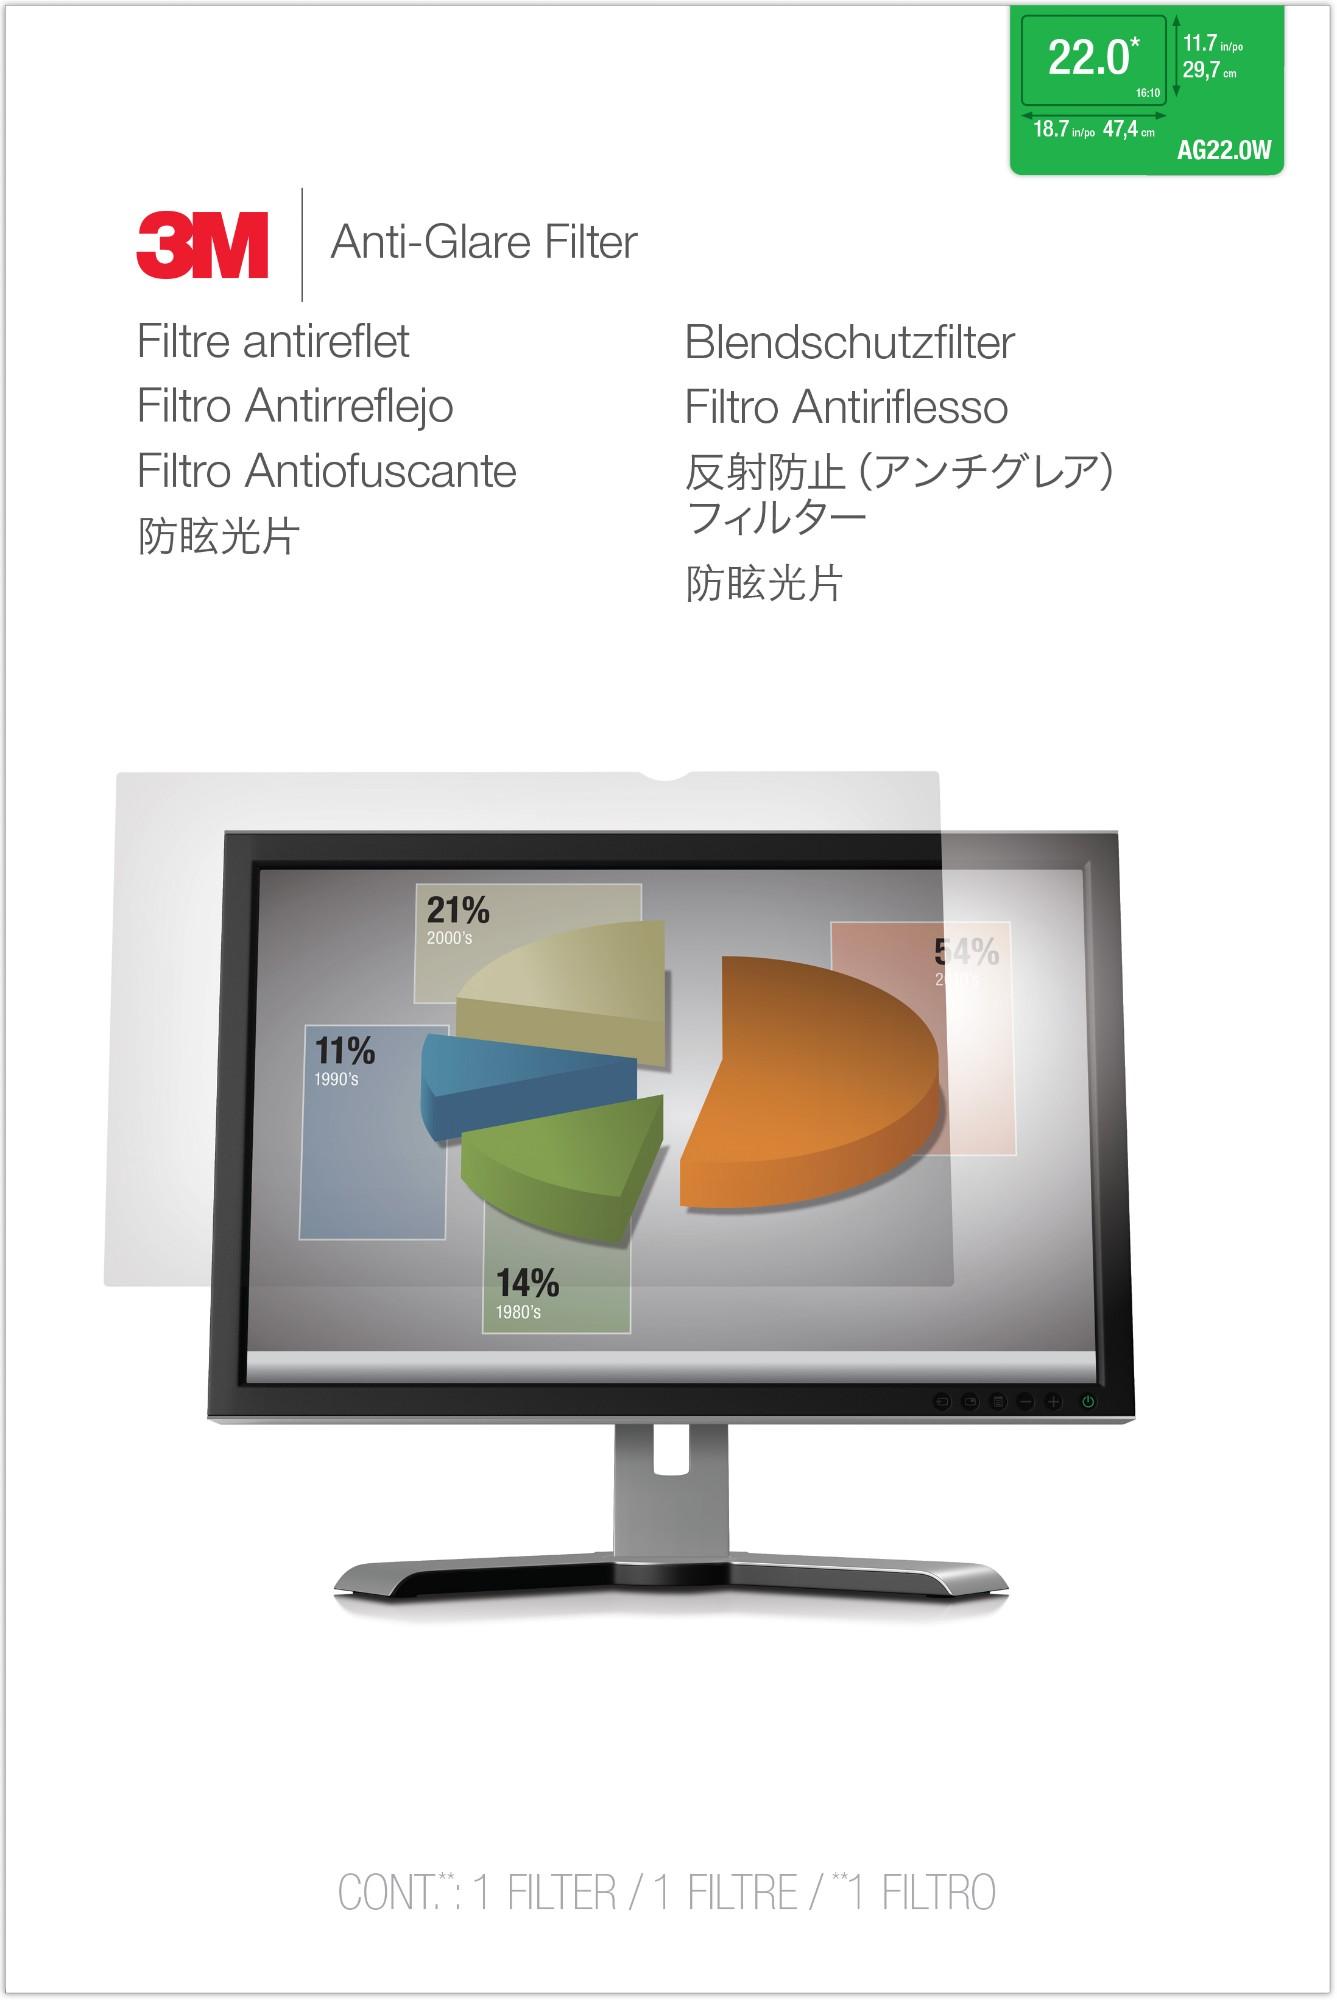 3M AG 22.0W Anti-Glare Filter